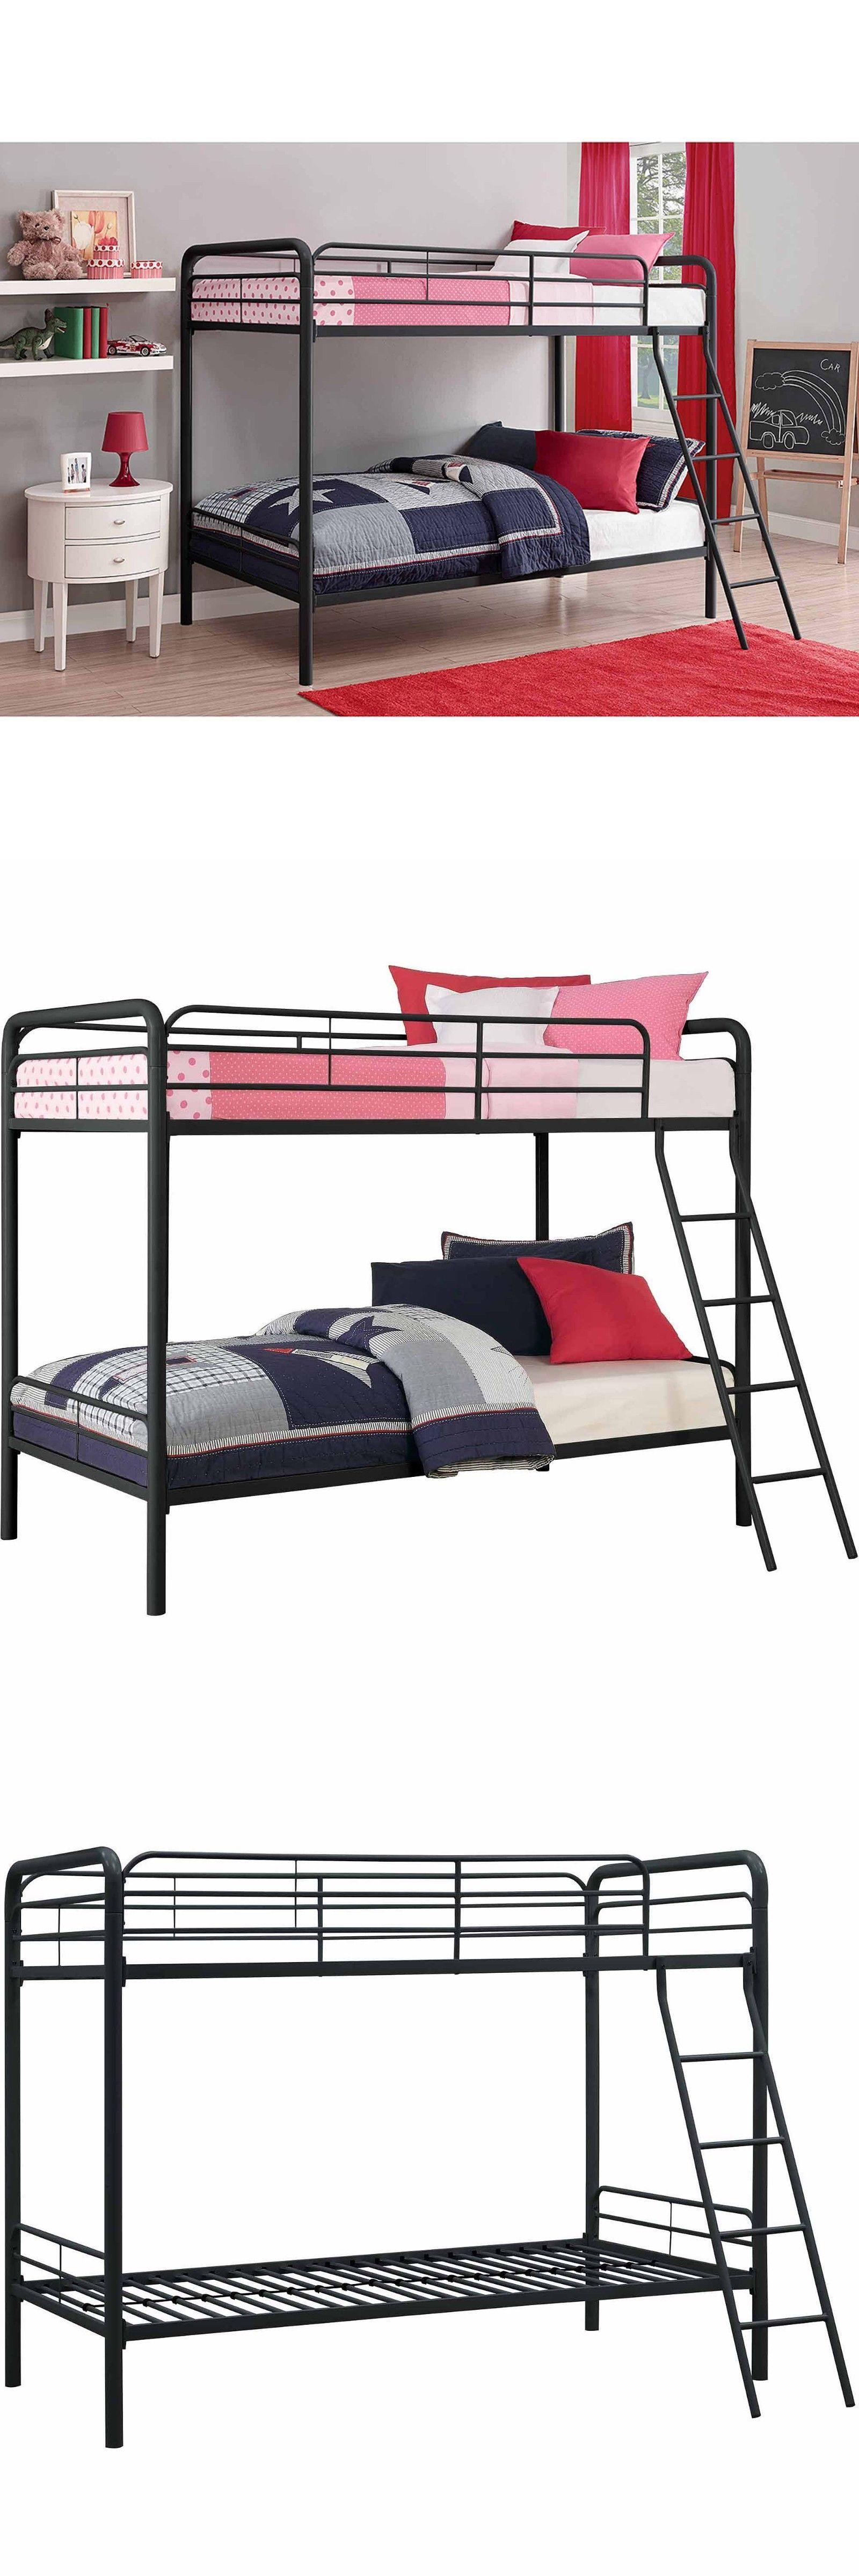 bedroom furniture 66742 dhp twin over twin metal bunk bed frame rh pinterest com